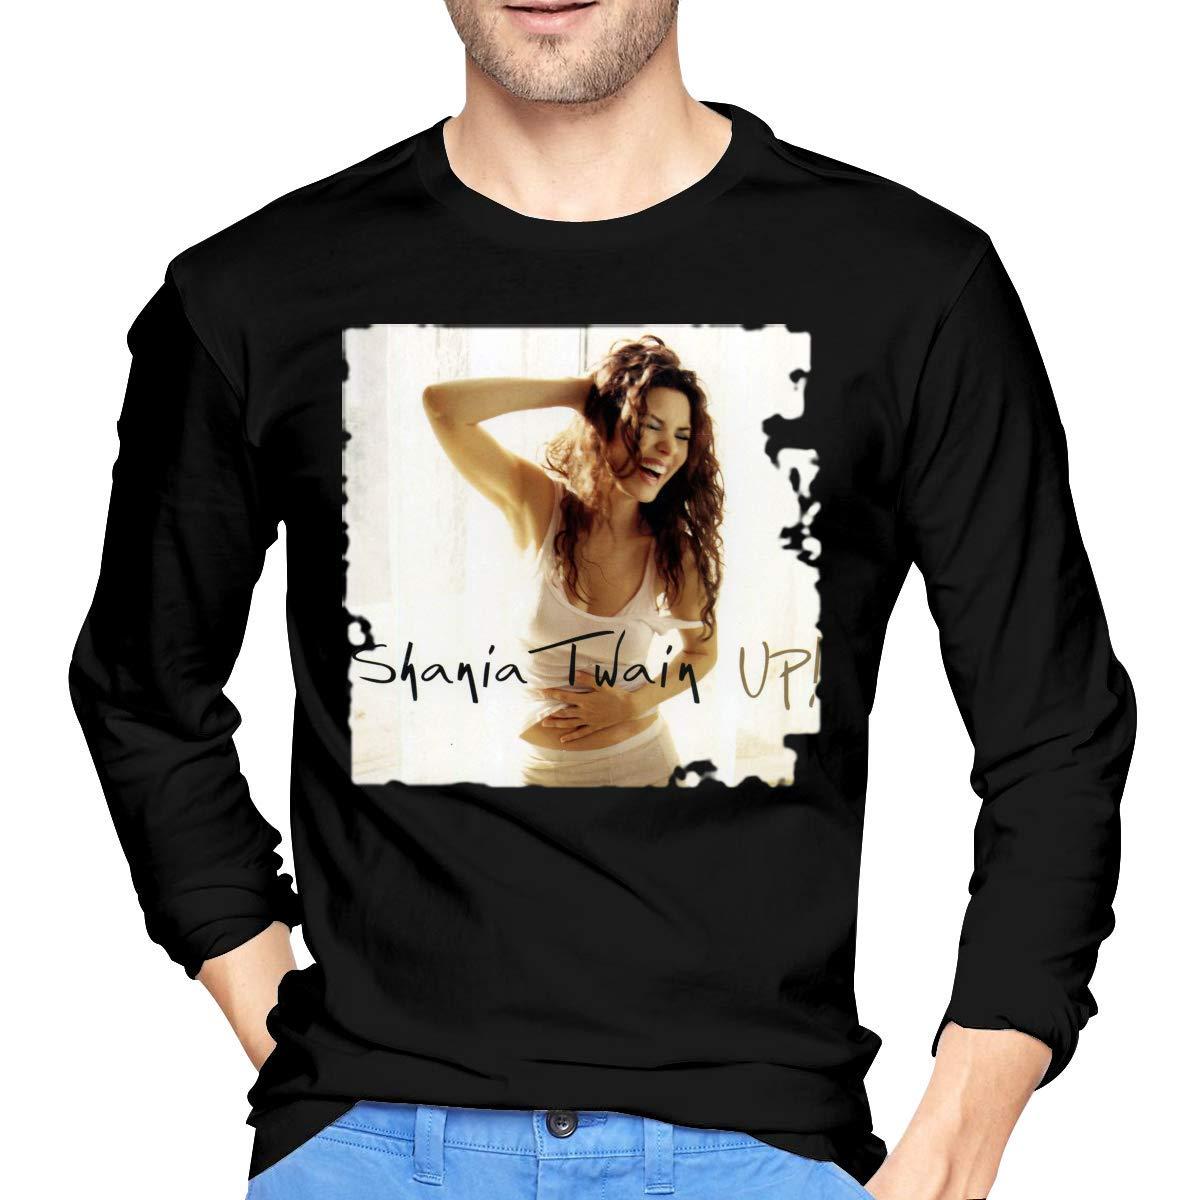 Fssatung S Shania Twain Up Tshirts Black